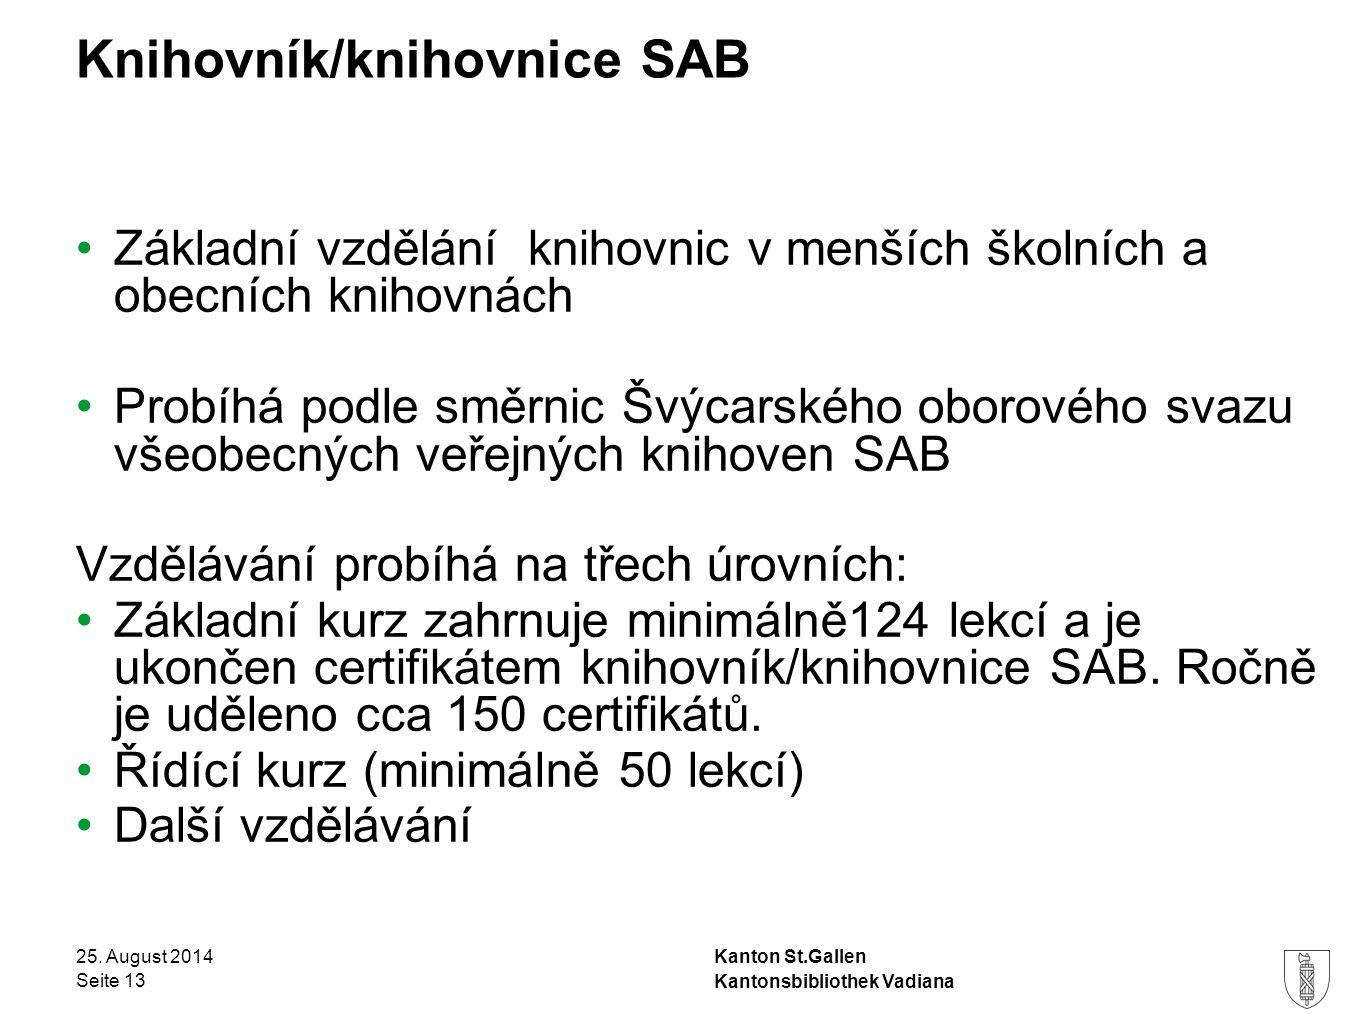 Kanton St.Gallen Knihovník/knihovnice SAB 25.